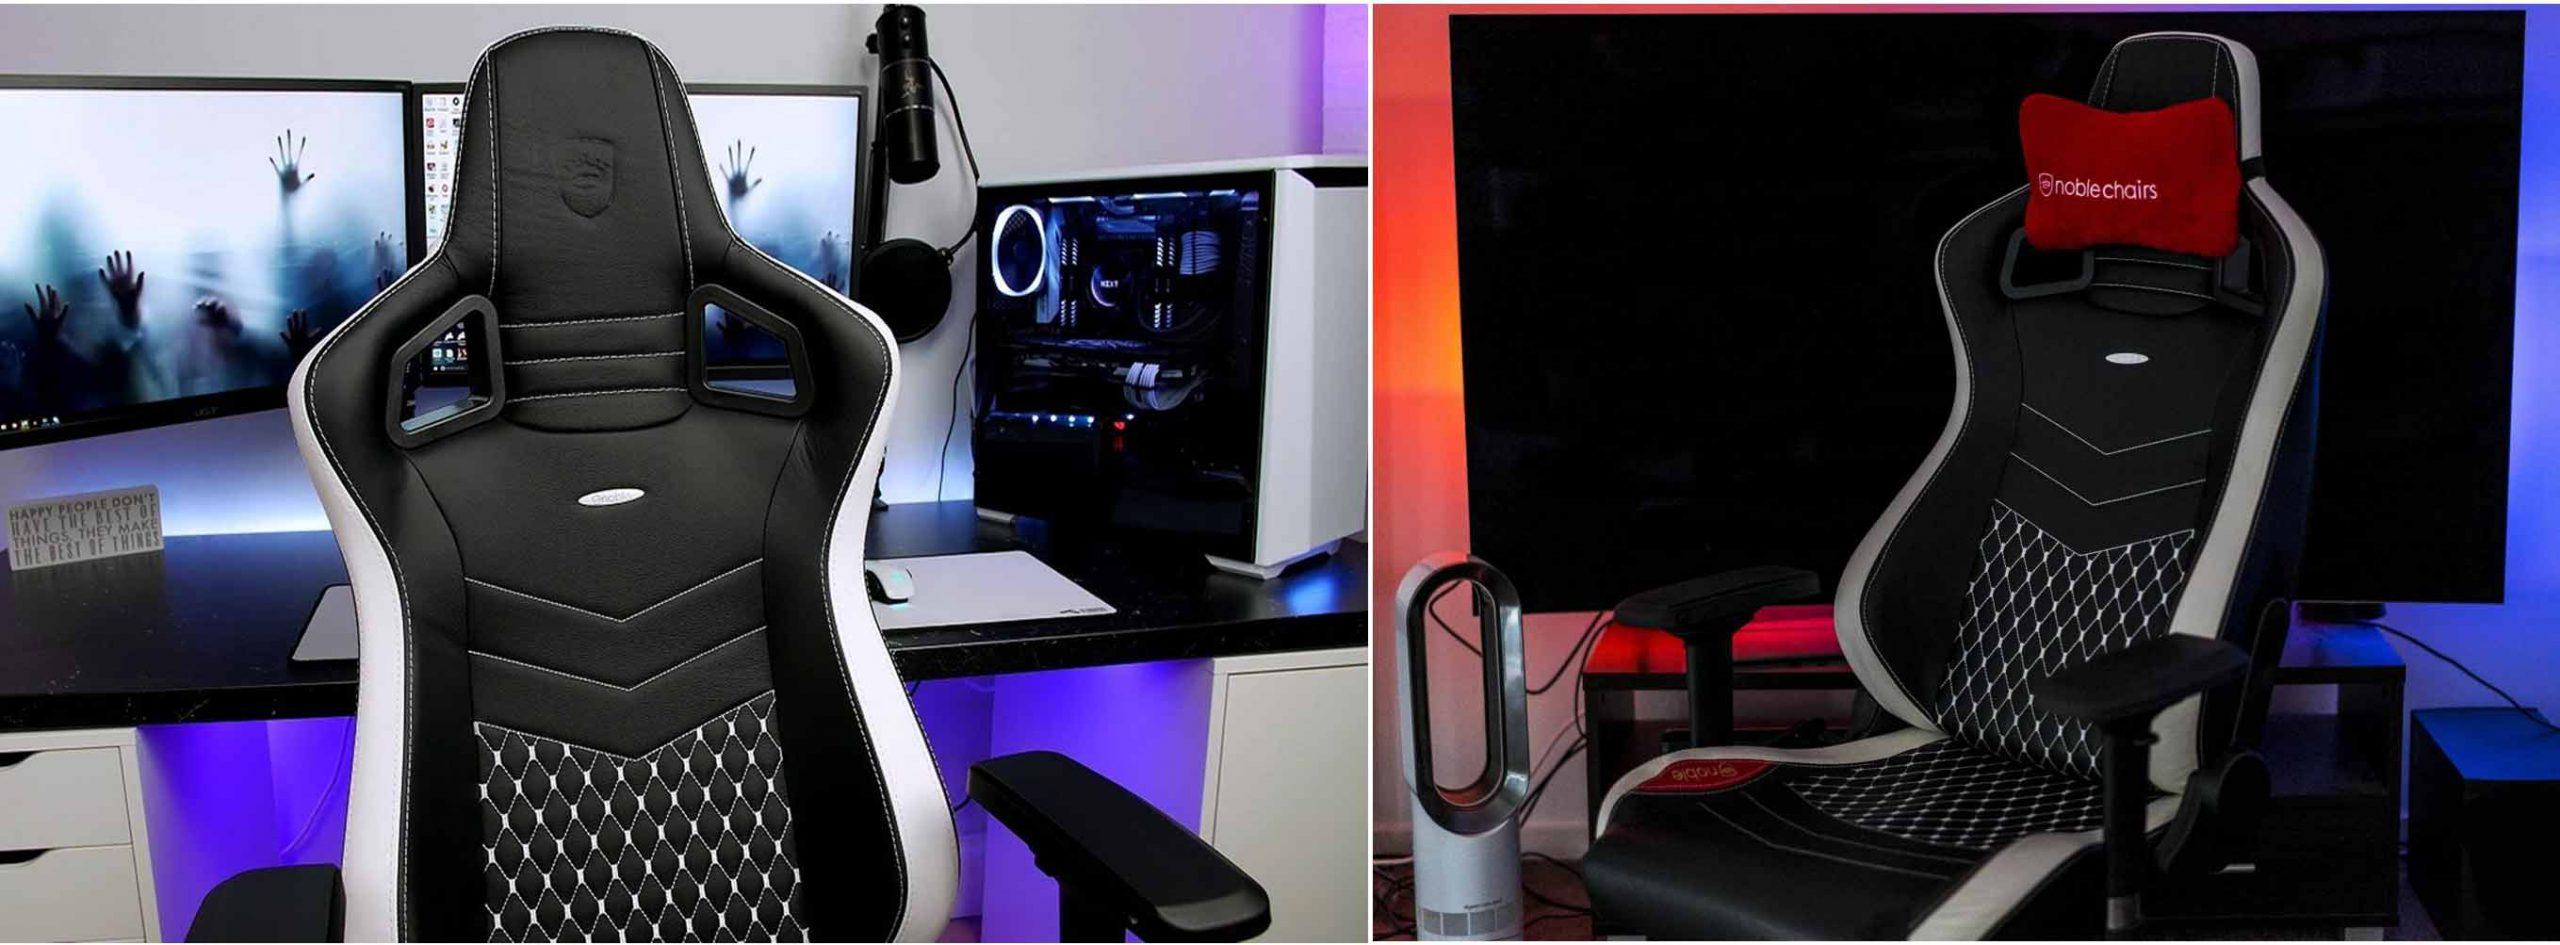 gaming chairs  - صندلی های بازی - تاریخچه-و-کاربرد-صندلی-های-گیمینگ-صندلی-گیمینگ-صندلی-بازی-Noblechairs-Epic-Real-Leather-gaming-chair-1-